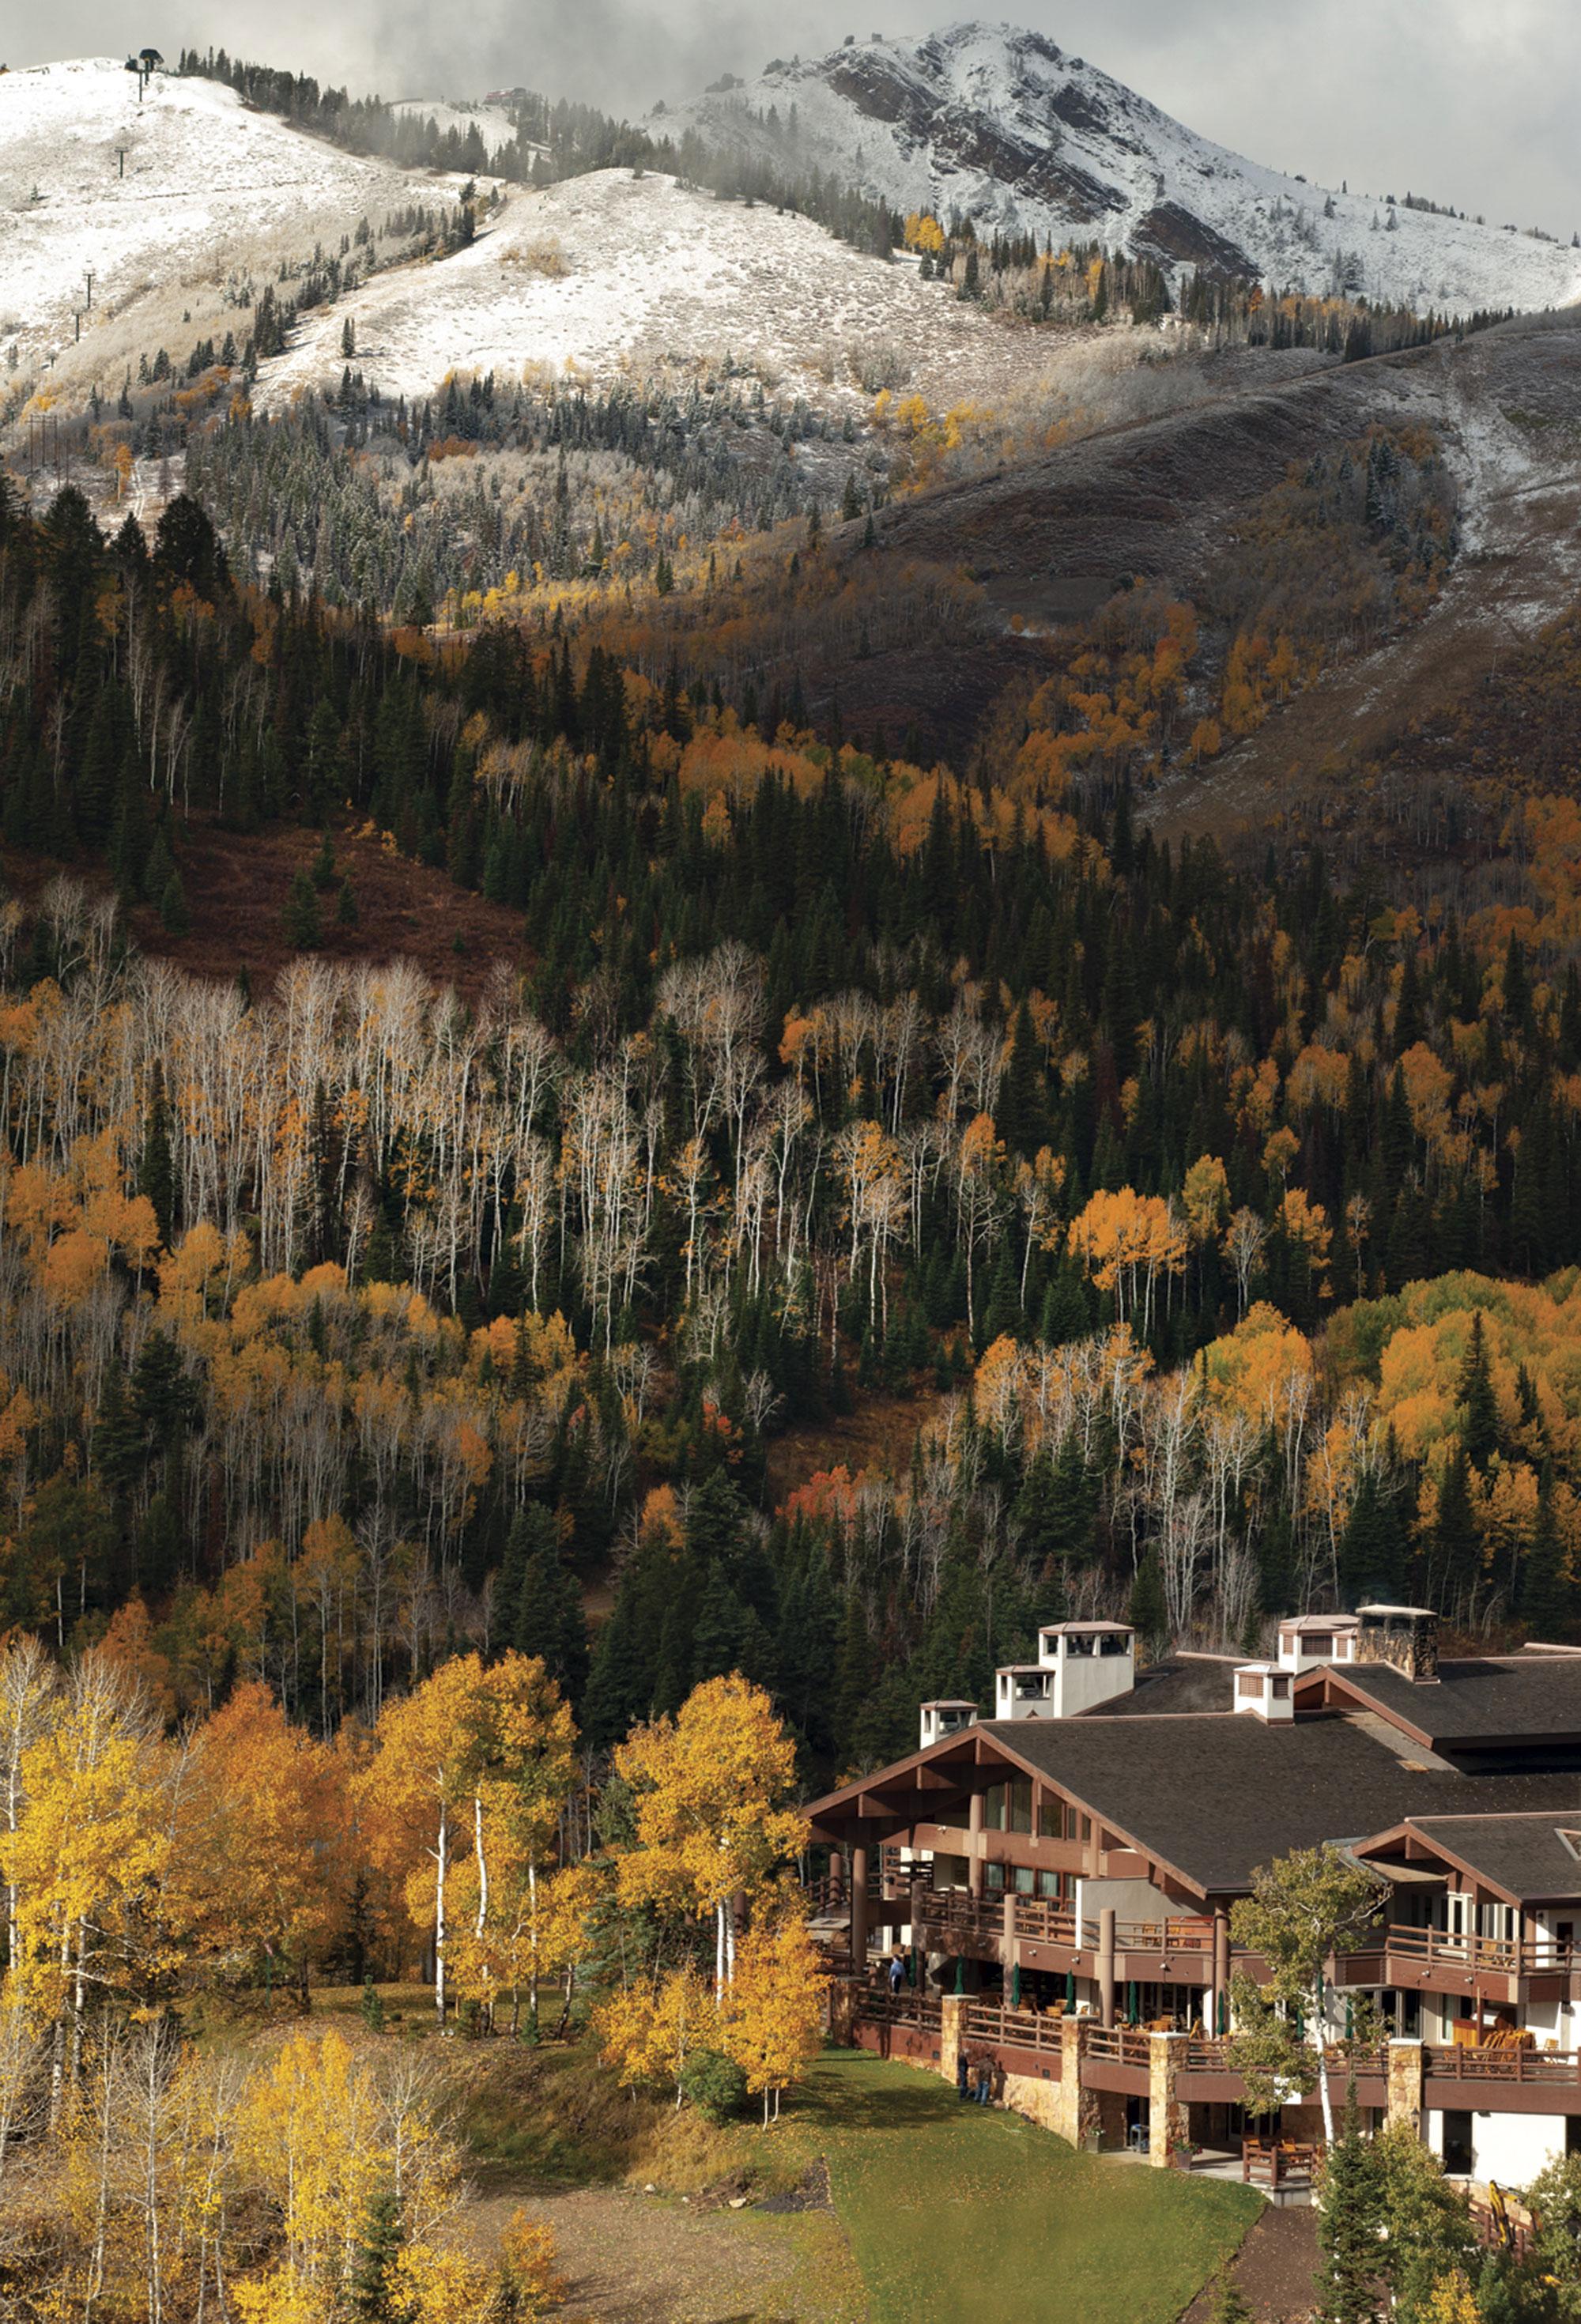 Bald Mountain; Photo courtesy J Public Relations